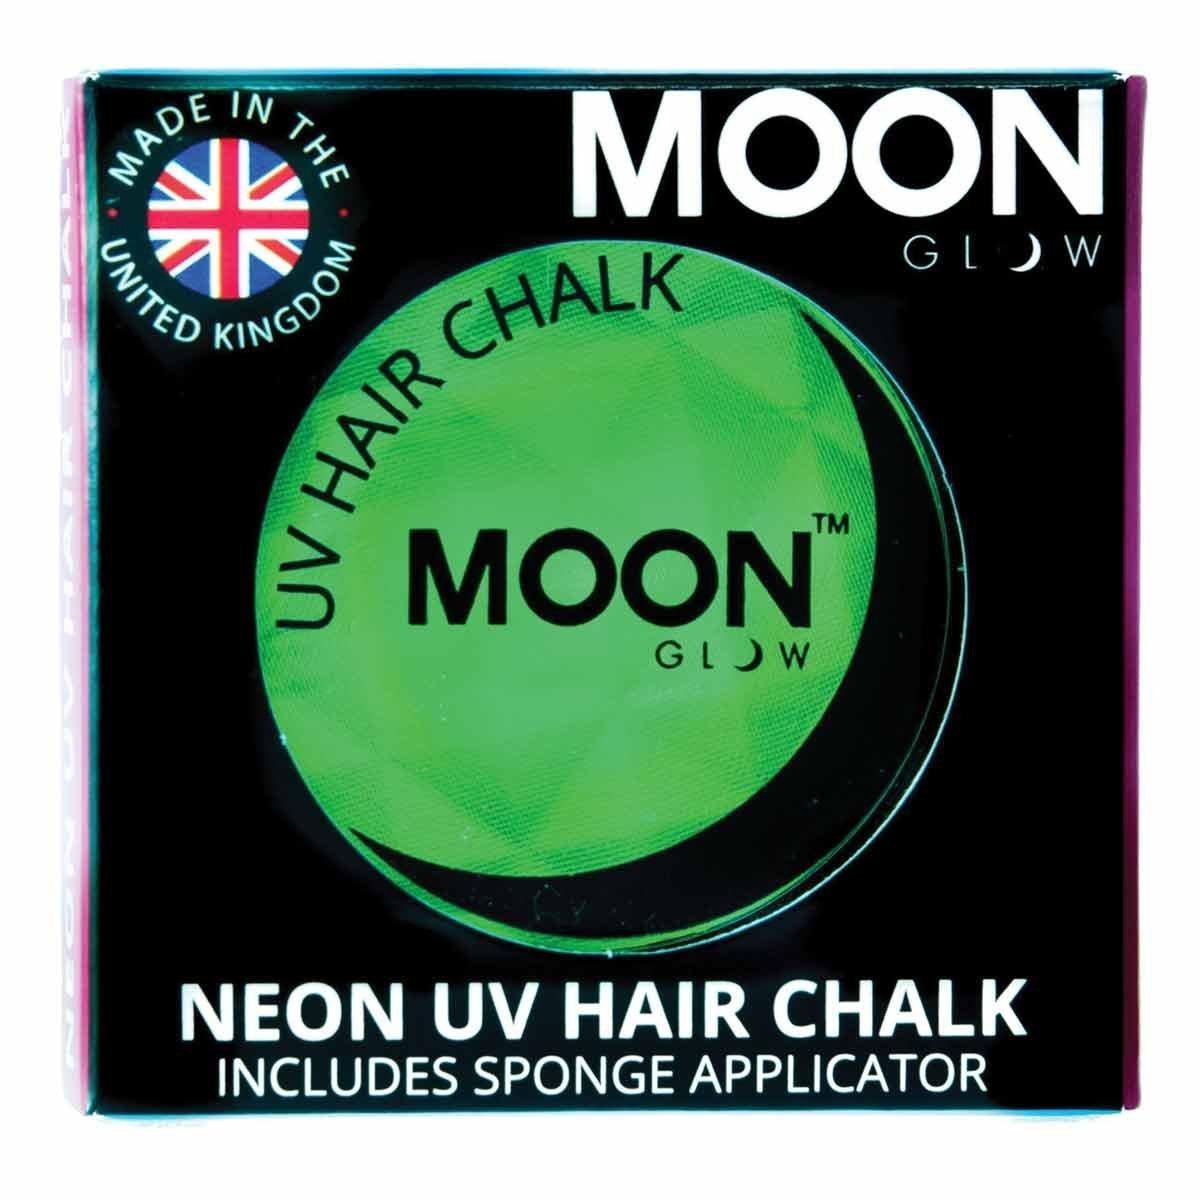 Moon Glow - Blacklight Neon Hair Chalk 0.12ozGreen– Glows brightly under Blacklights / UV Lighting!